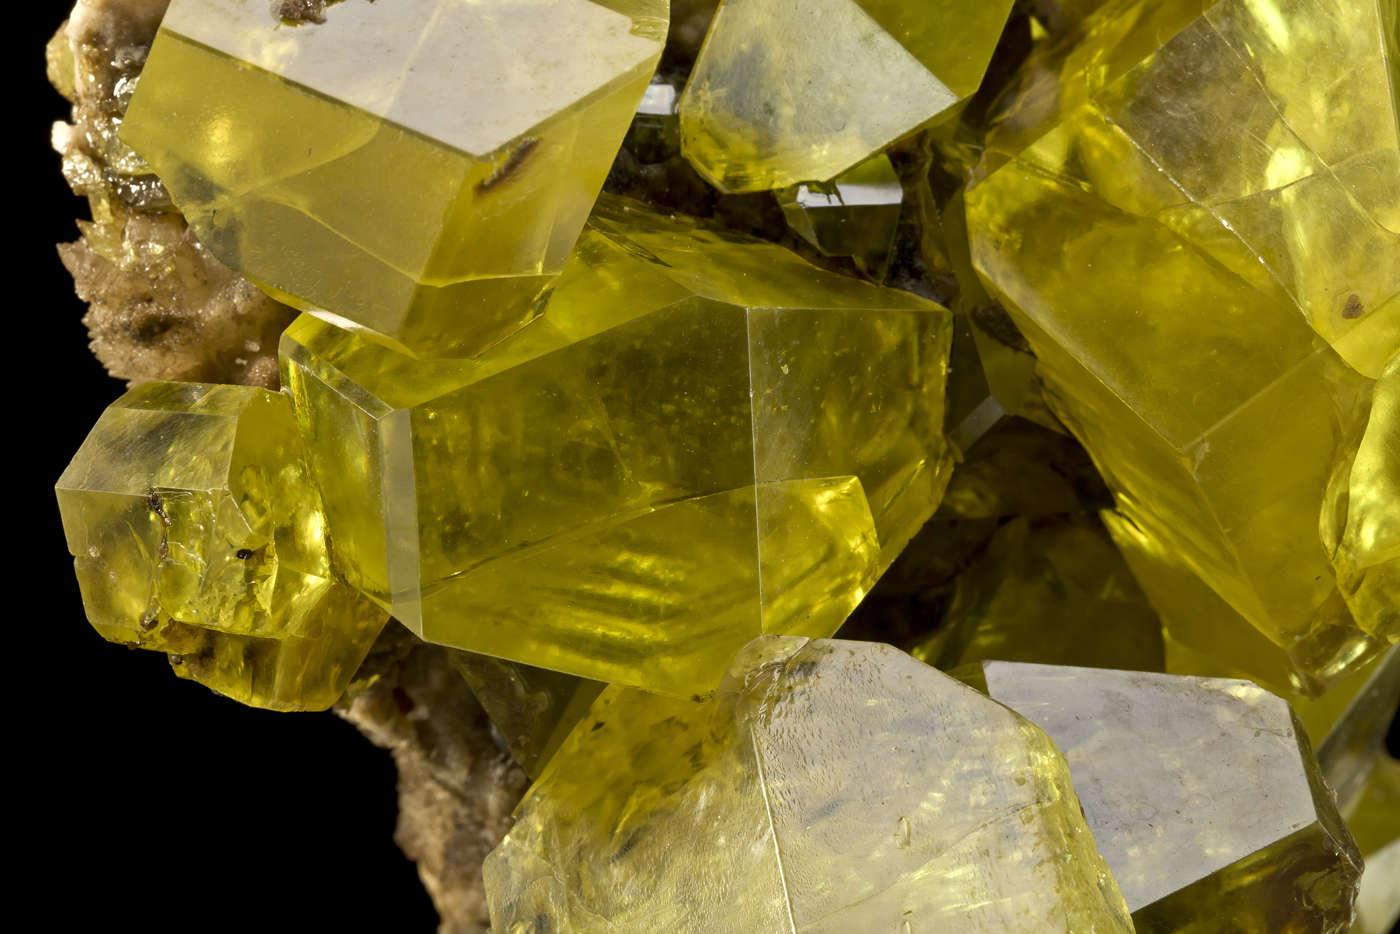 "Sulfur 2 1/2"" x 2 1/2"" - 3 1/2"" x 2"" - Celestial Earth ... |Sulfur Mineral"